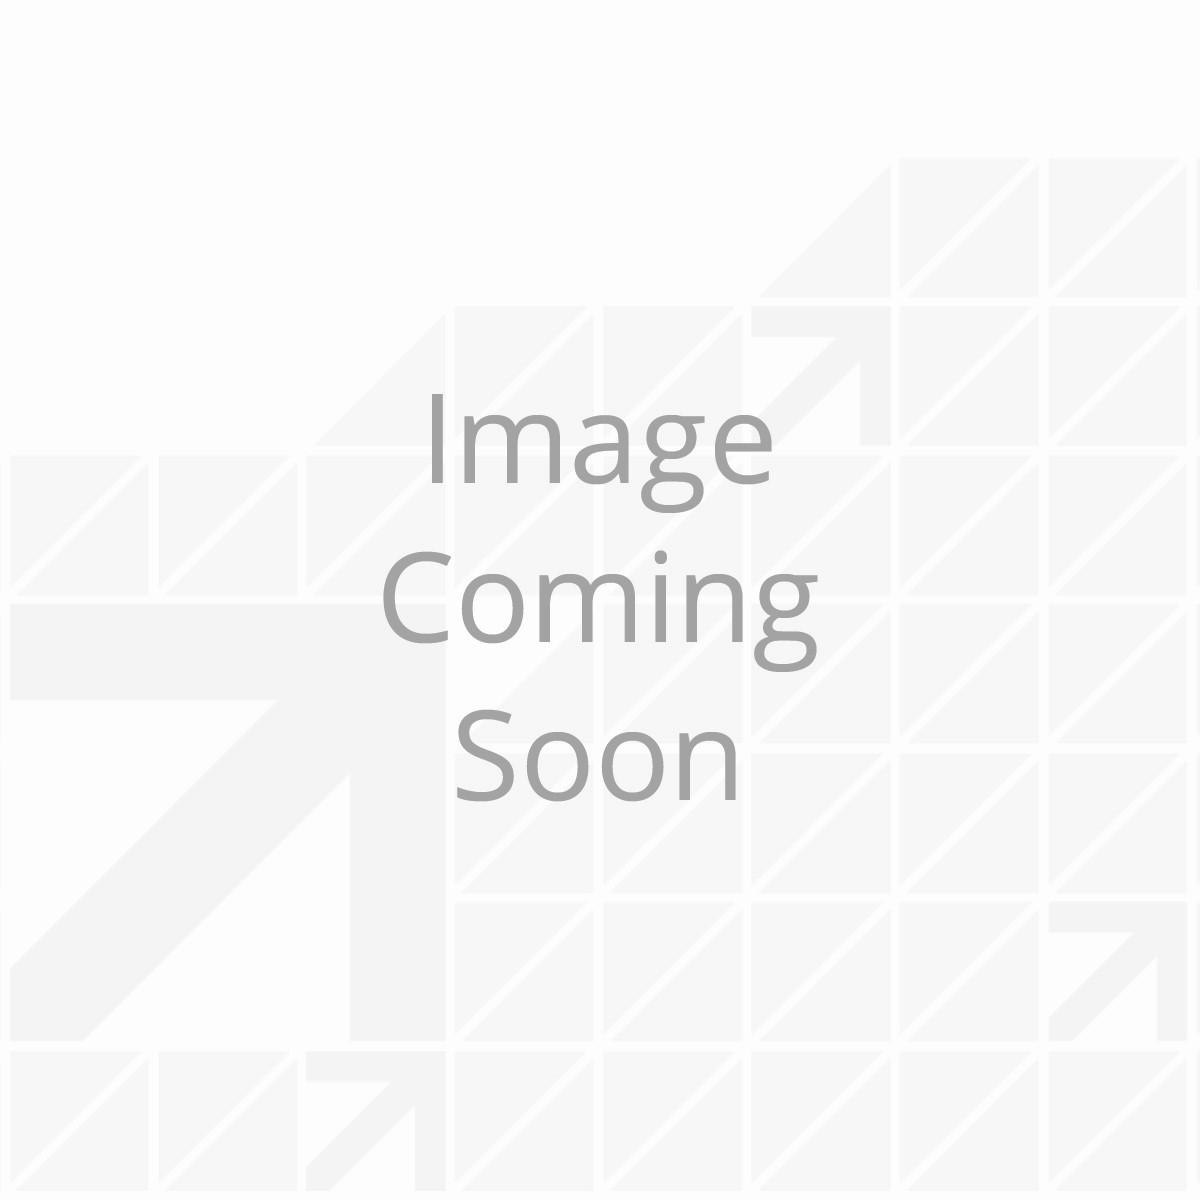 Heavy-Duty Axle Kit - Equa-Flex Equalizers - Various Sizes